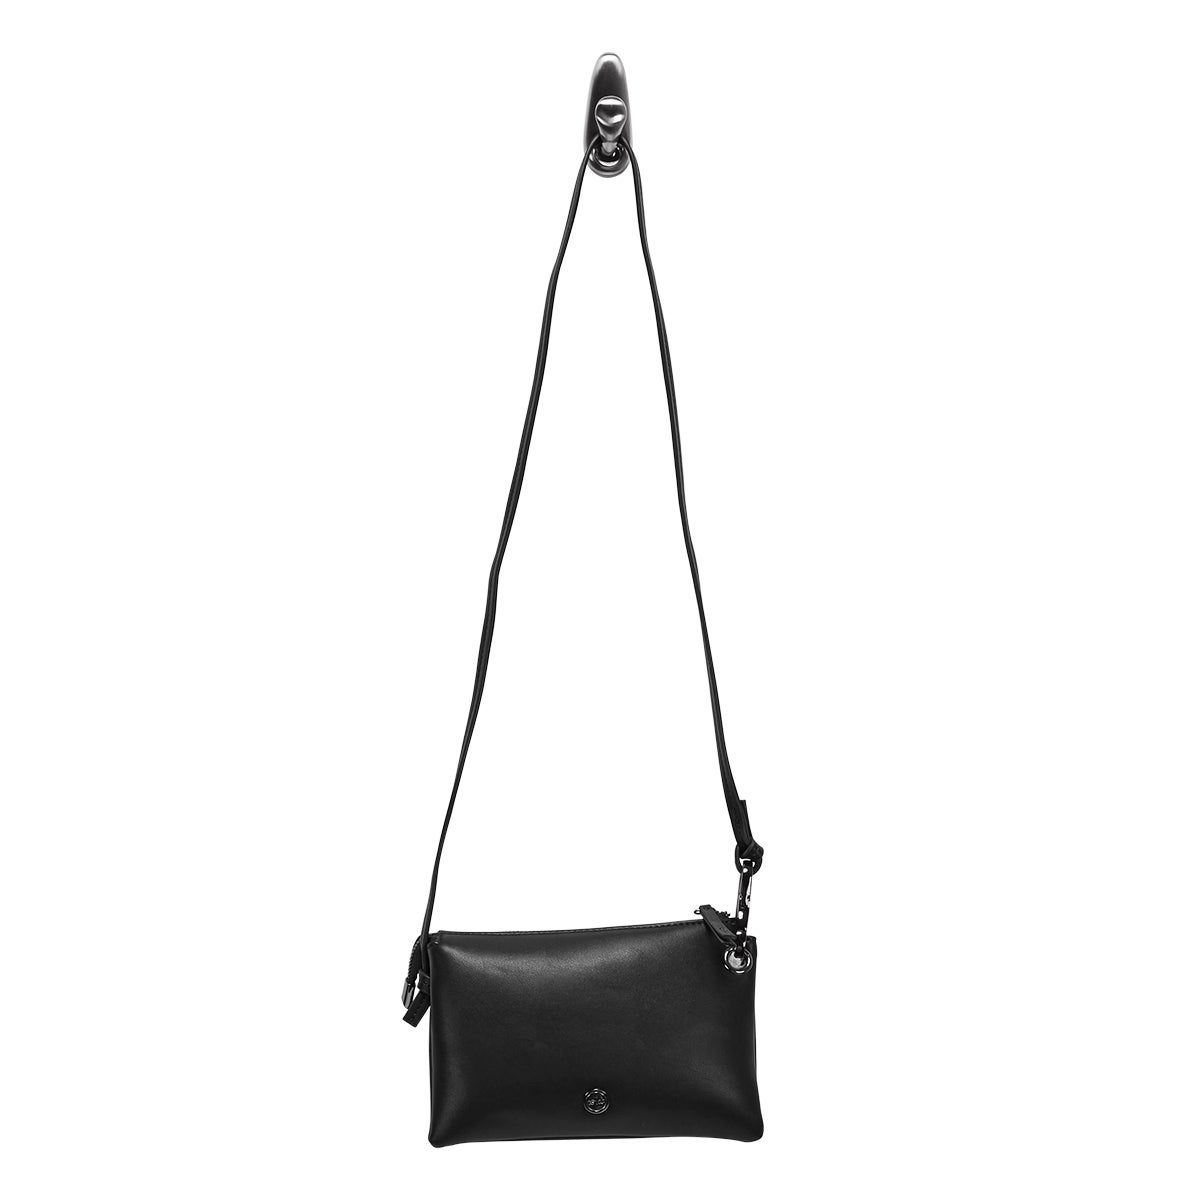 Lds black mini cross body bag